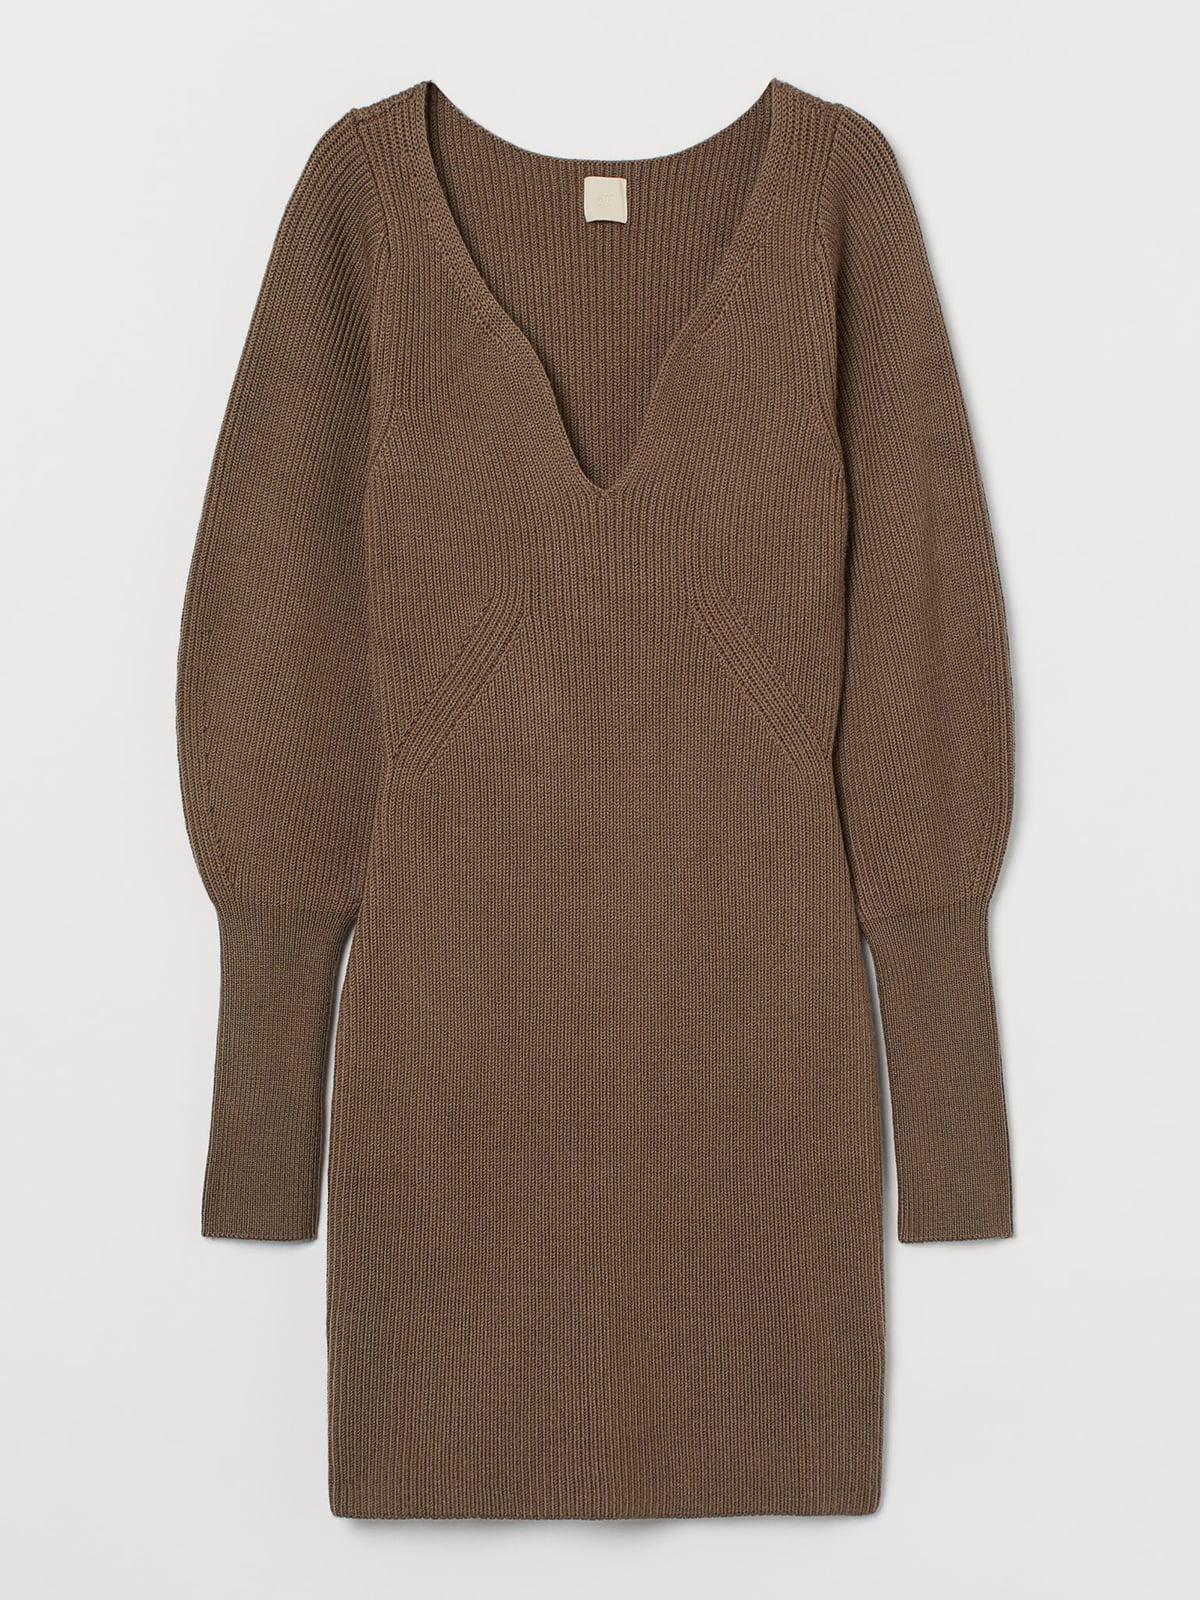 Платье коричневое   5721720